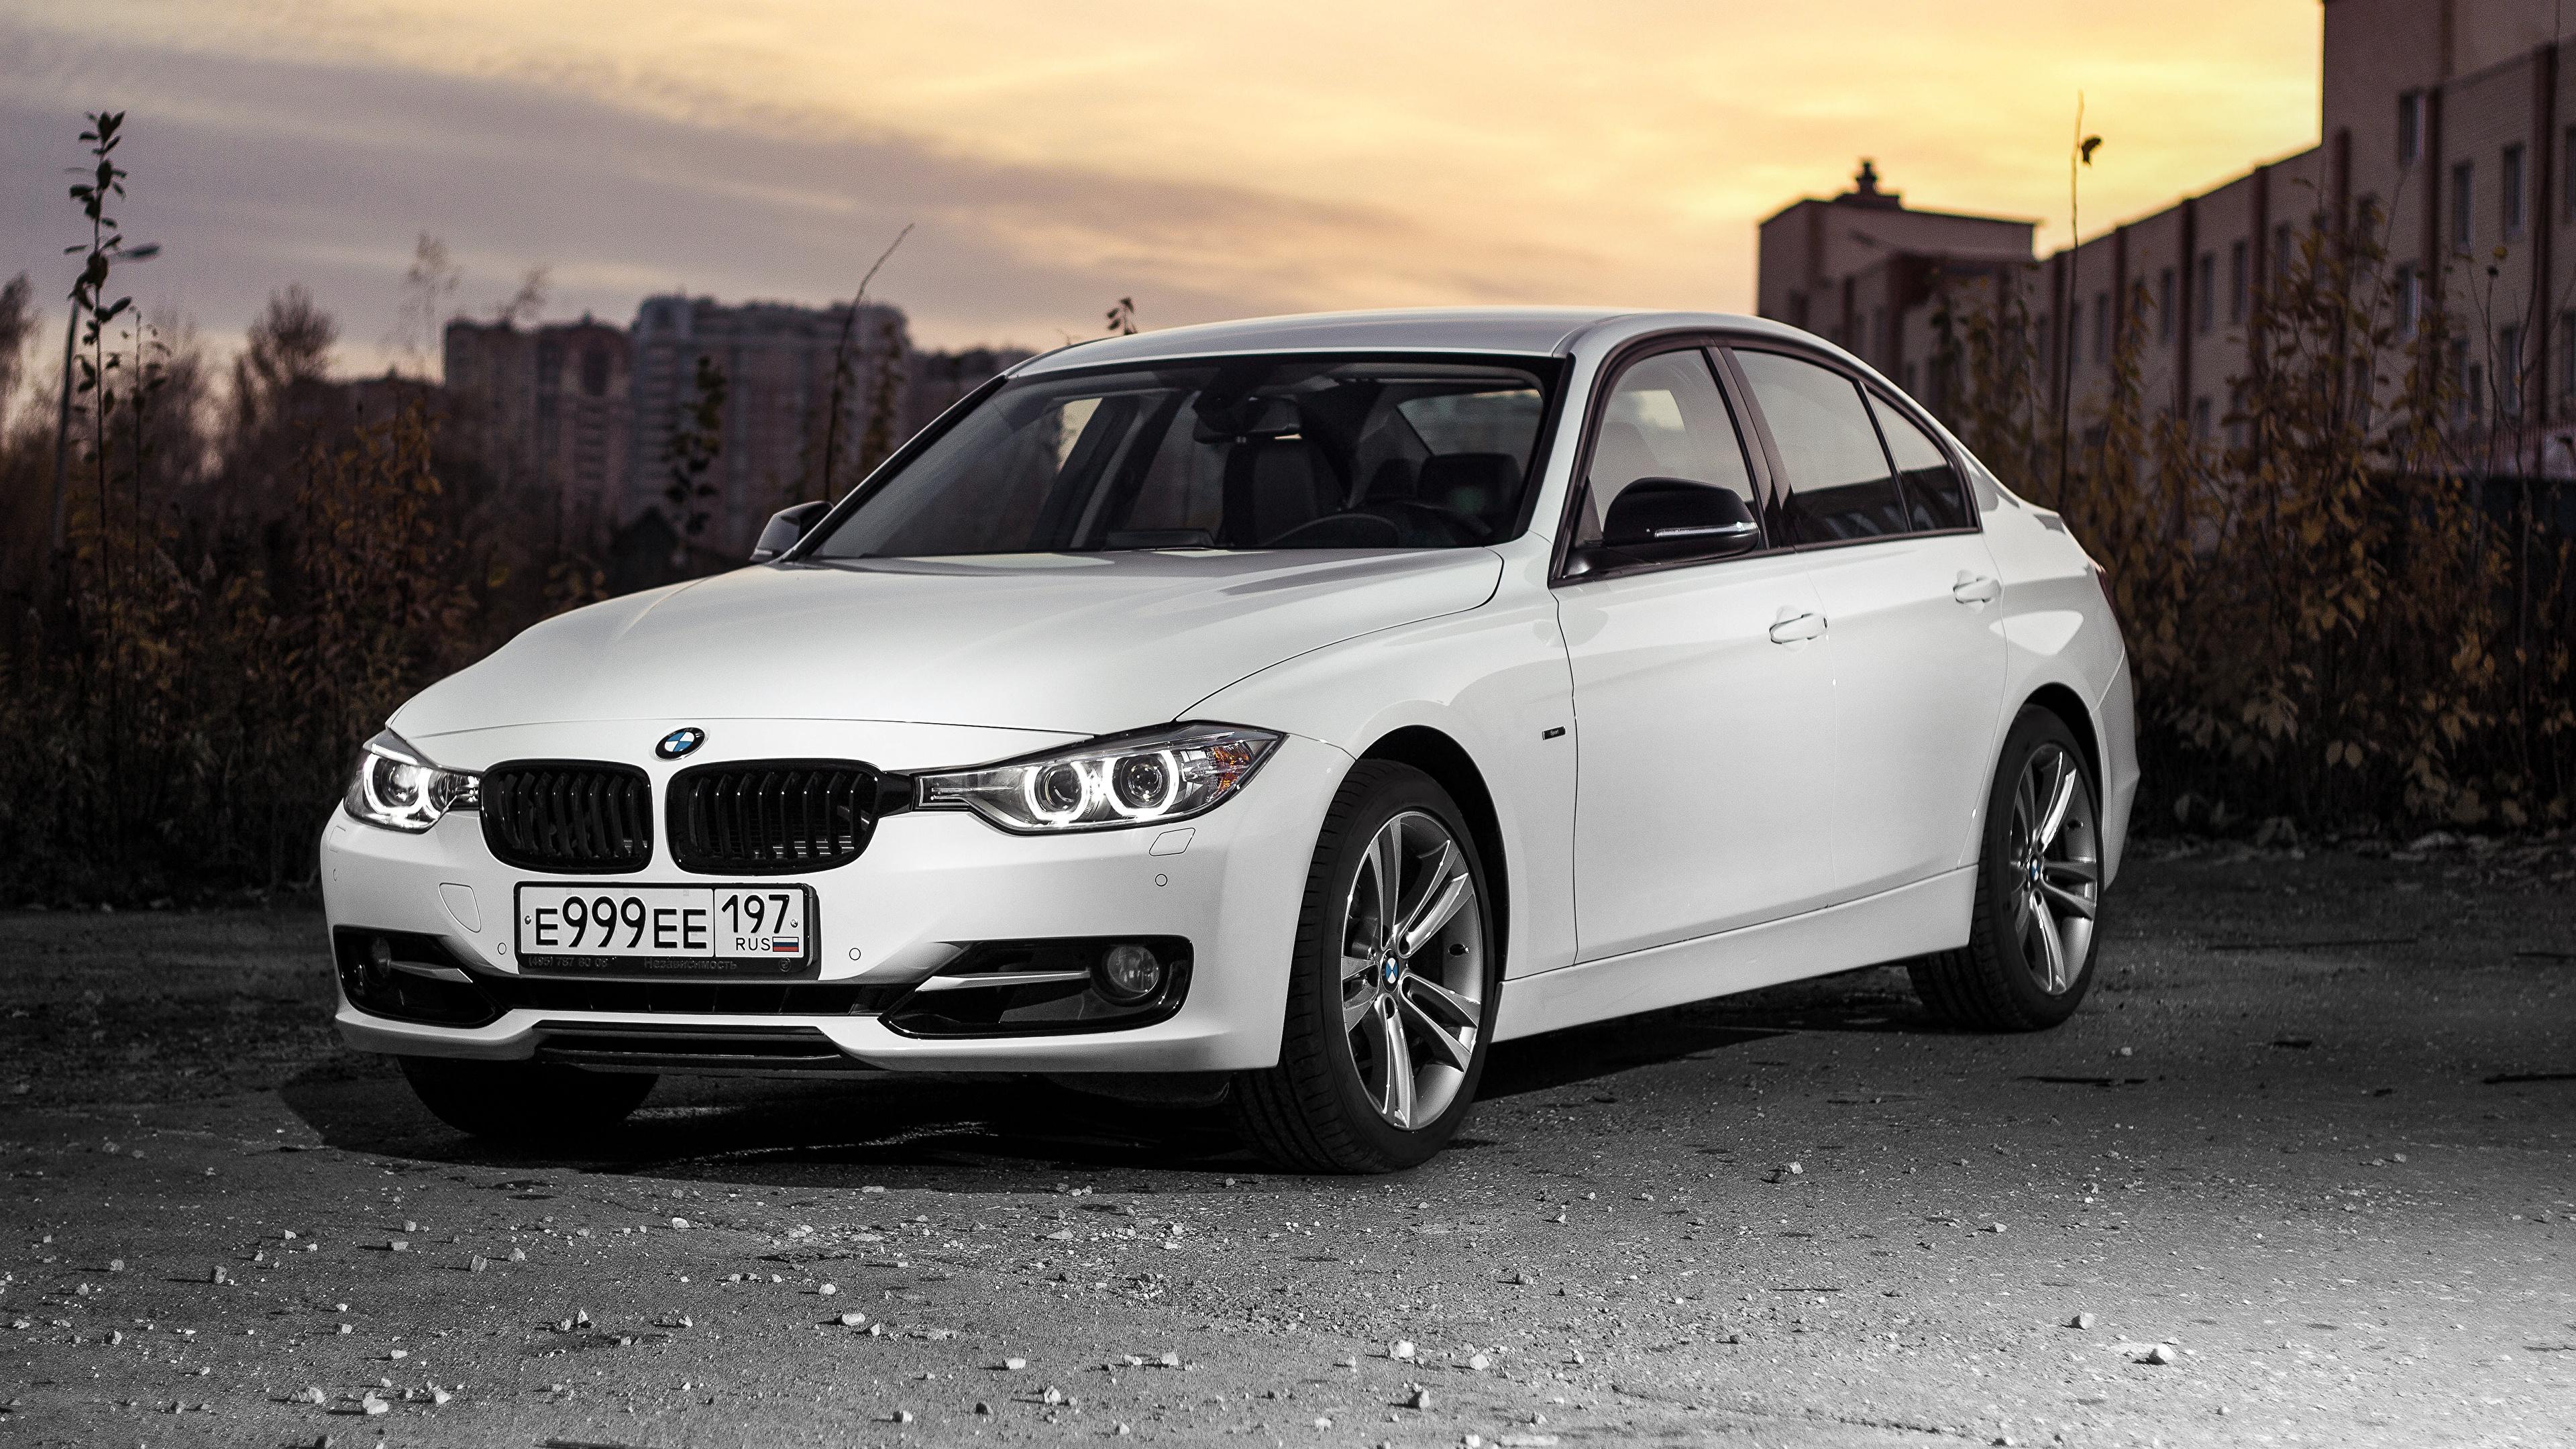 Images BMW 3 Series F30 Sedan White auto 3840x2160 3840x2160